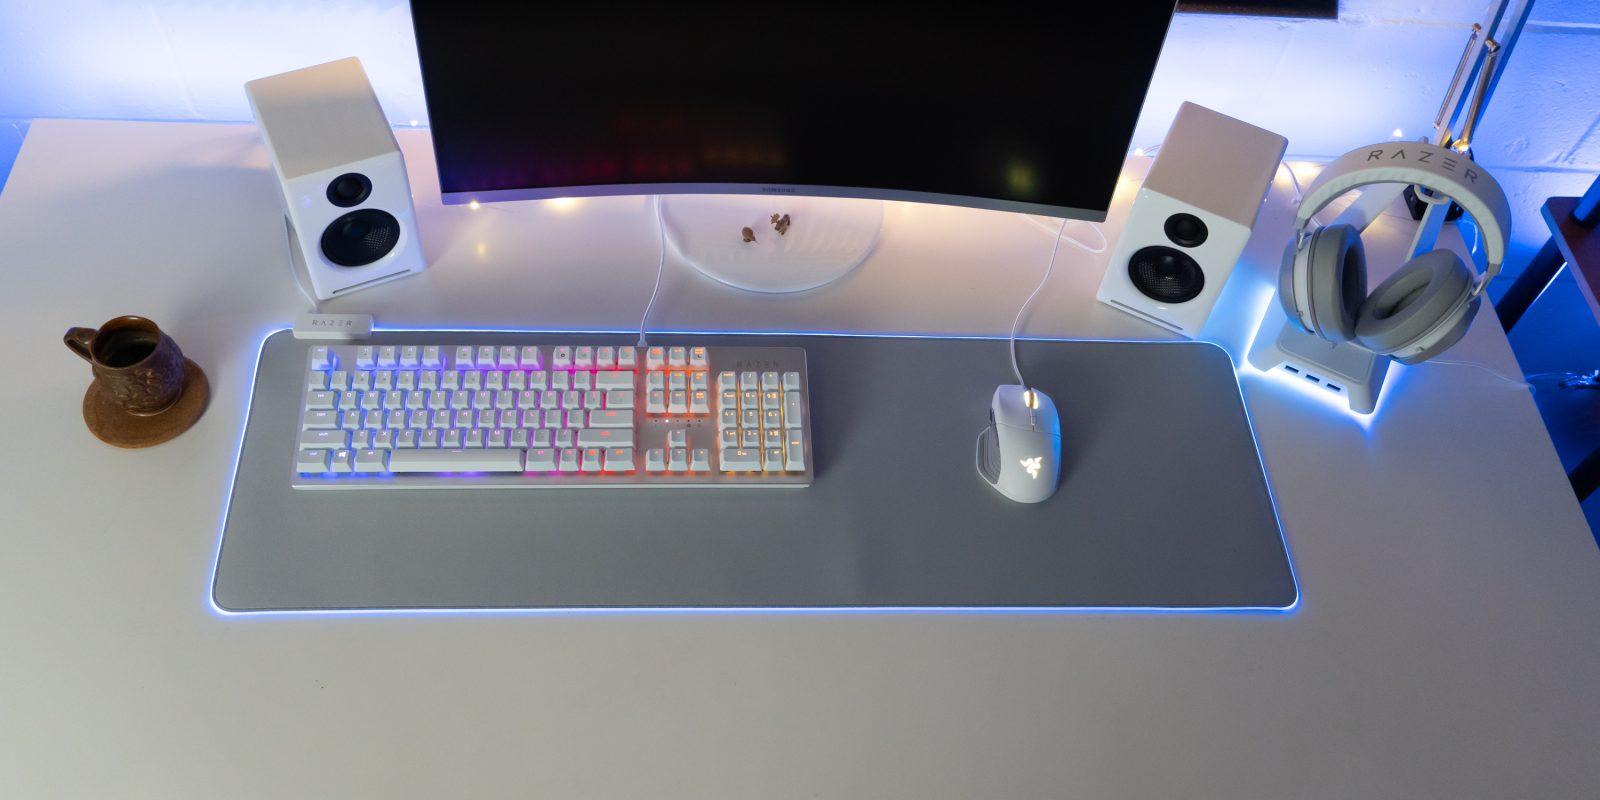 Razer Mercury Edition Quick Look: White gear for your battlestation [Video]